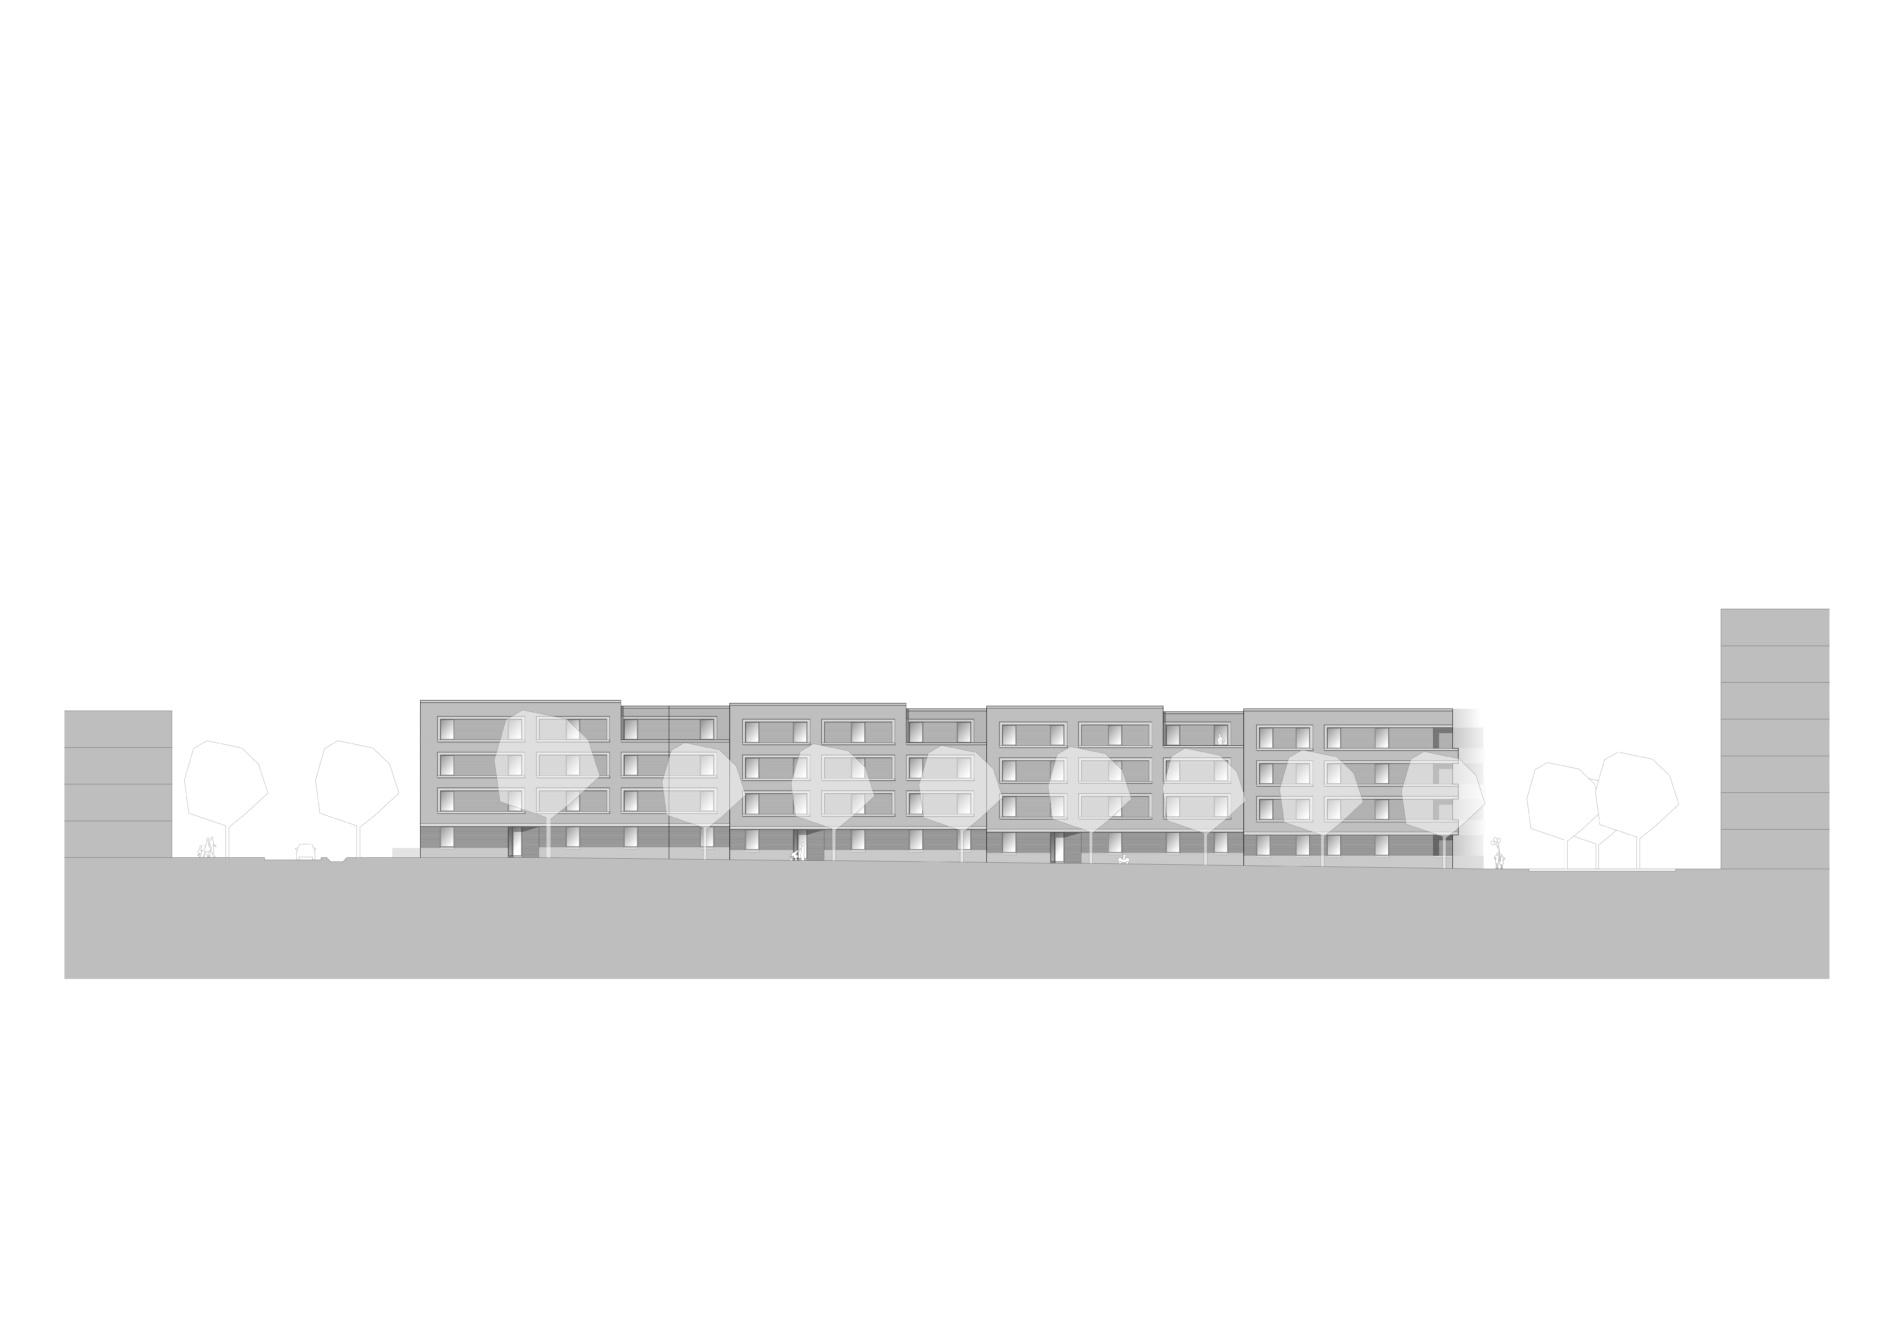 KBS Kronsberg Süd Hannover Westphal Architekten